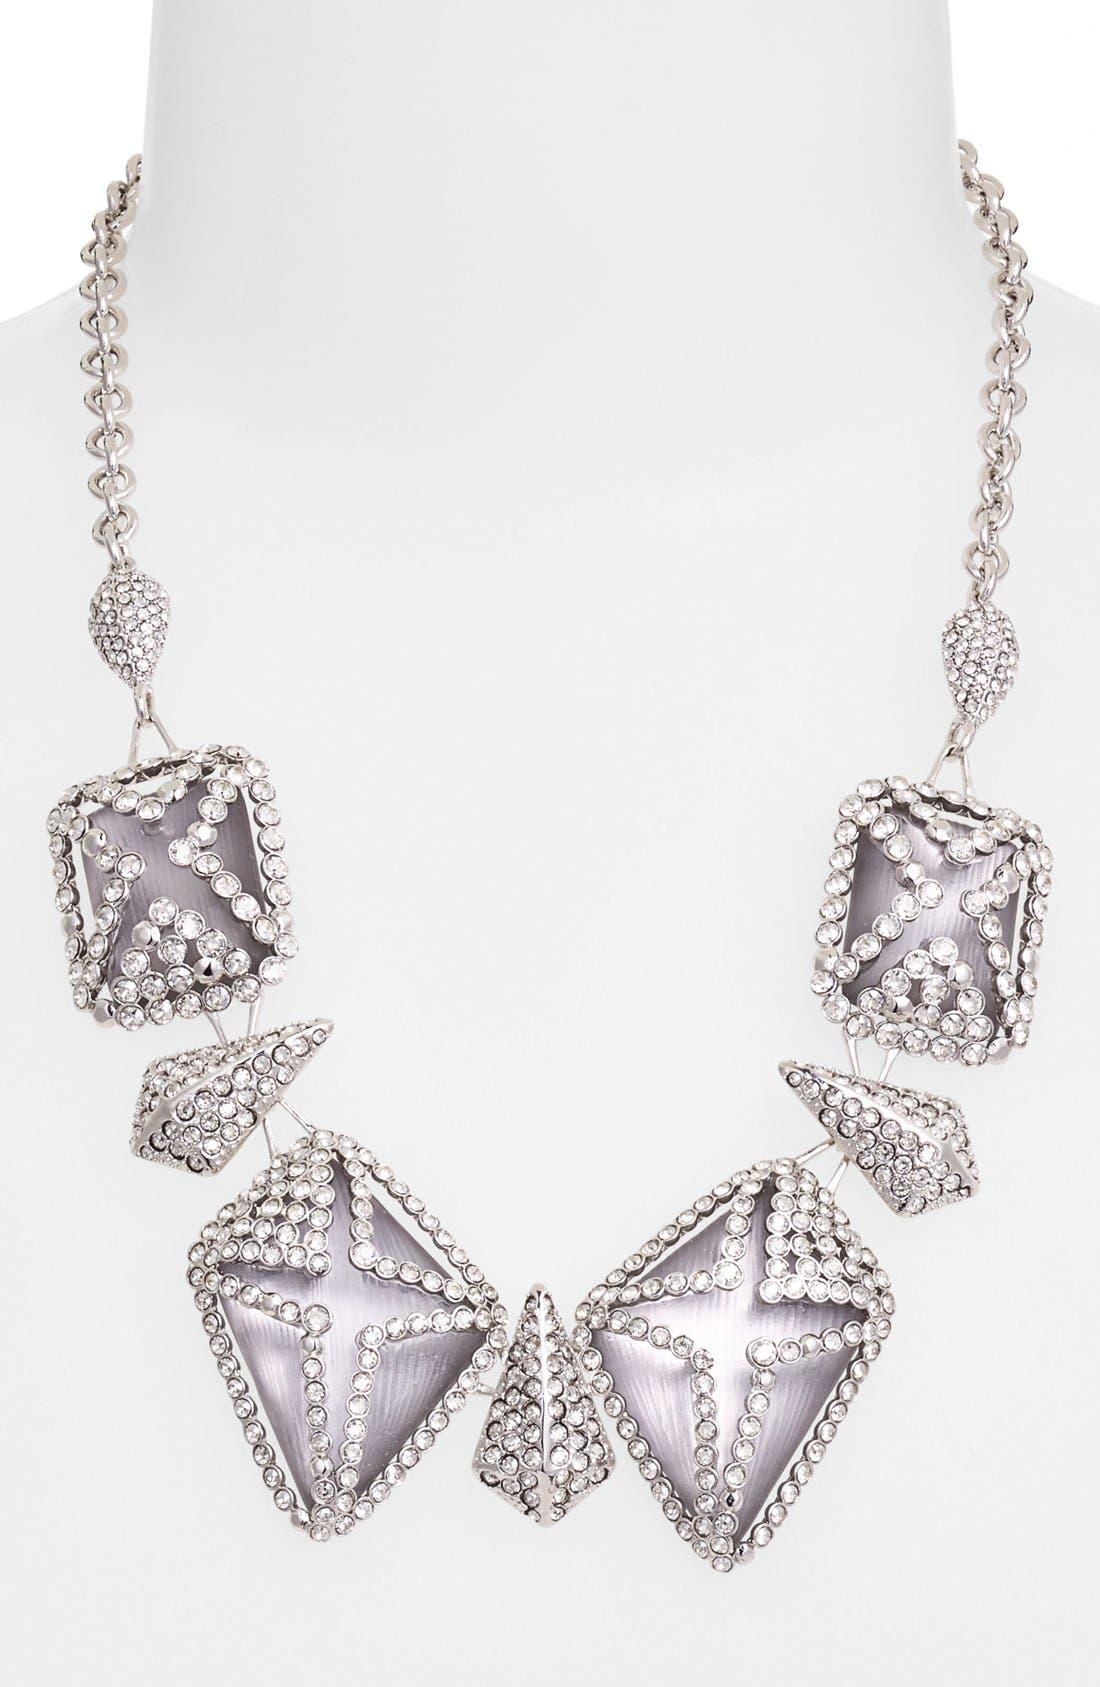 Alternate Image 1 Selected - Alexis Bittar 'Lucite® - Winter Deco' Bib Necklace